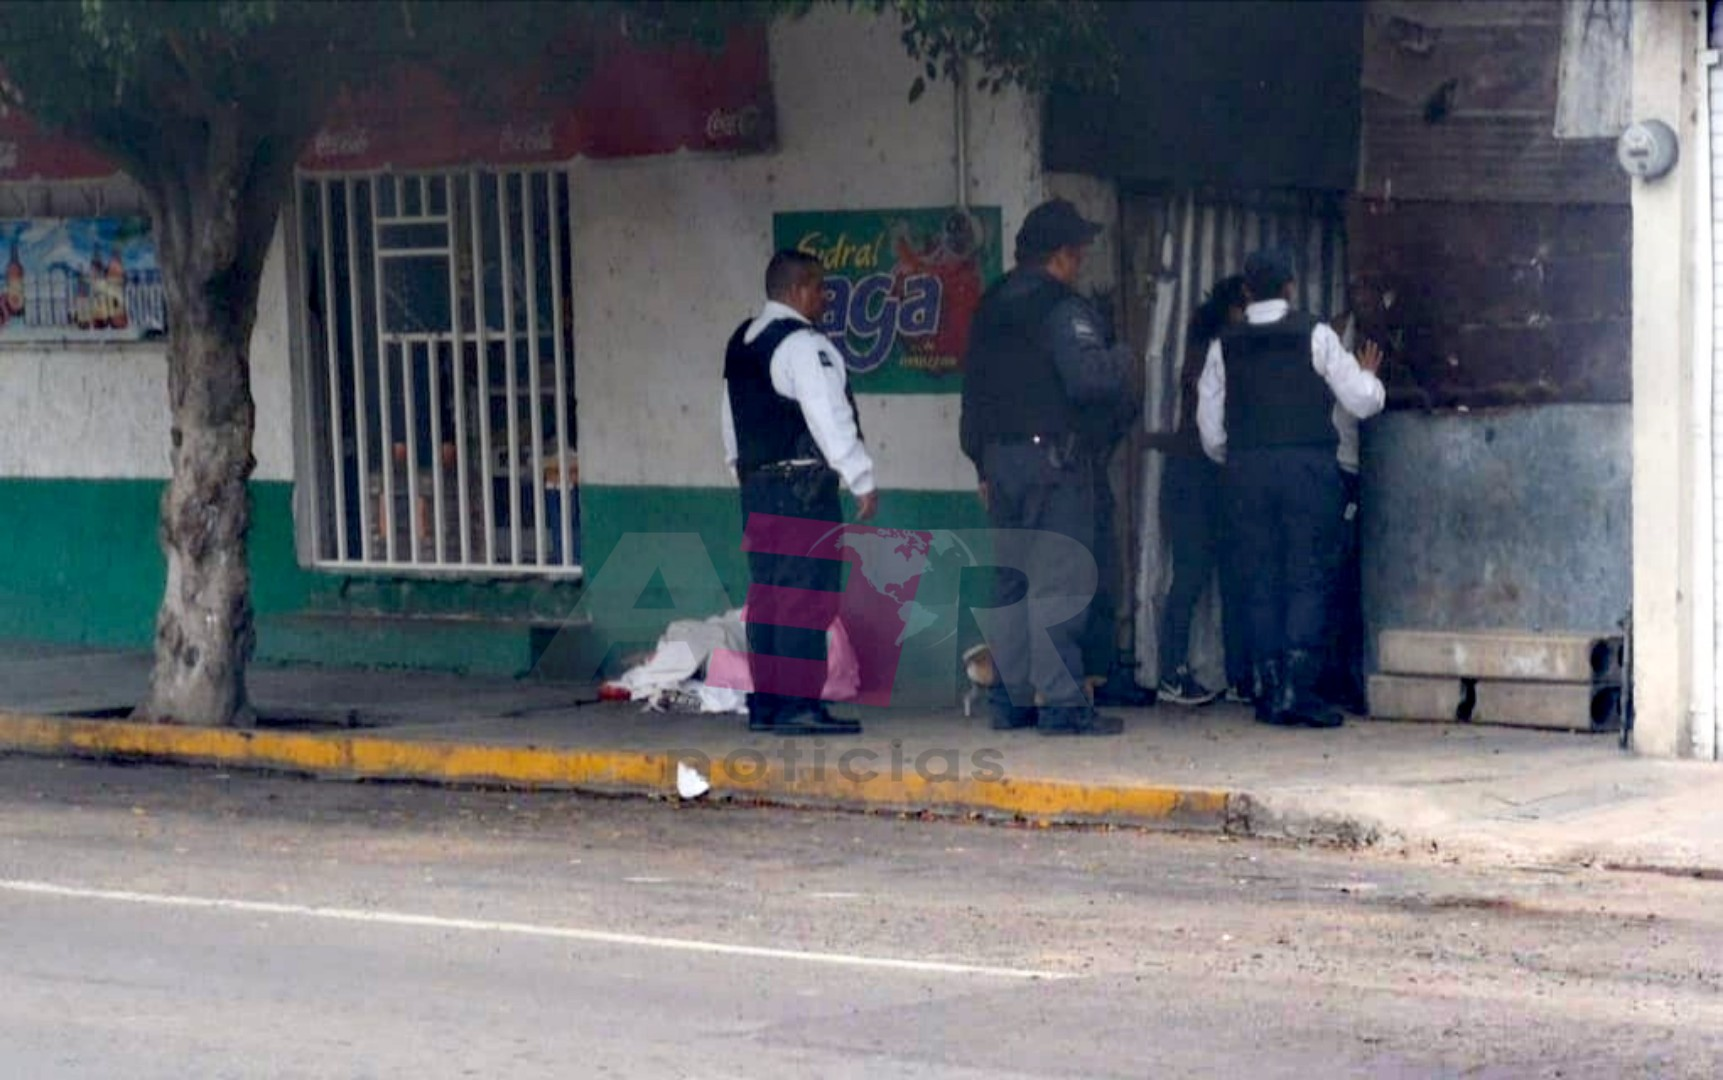 EJECUTAN A HOMBRE EN CALZADA DE LOS CHINACOS 3